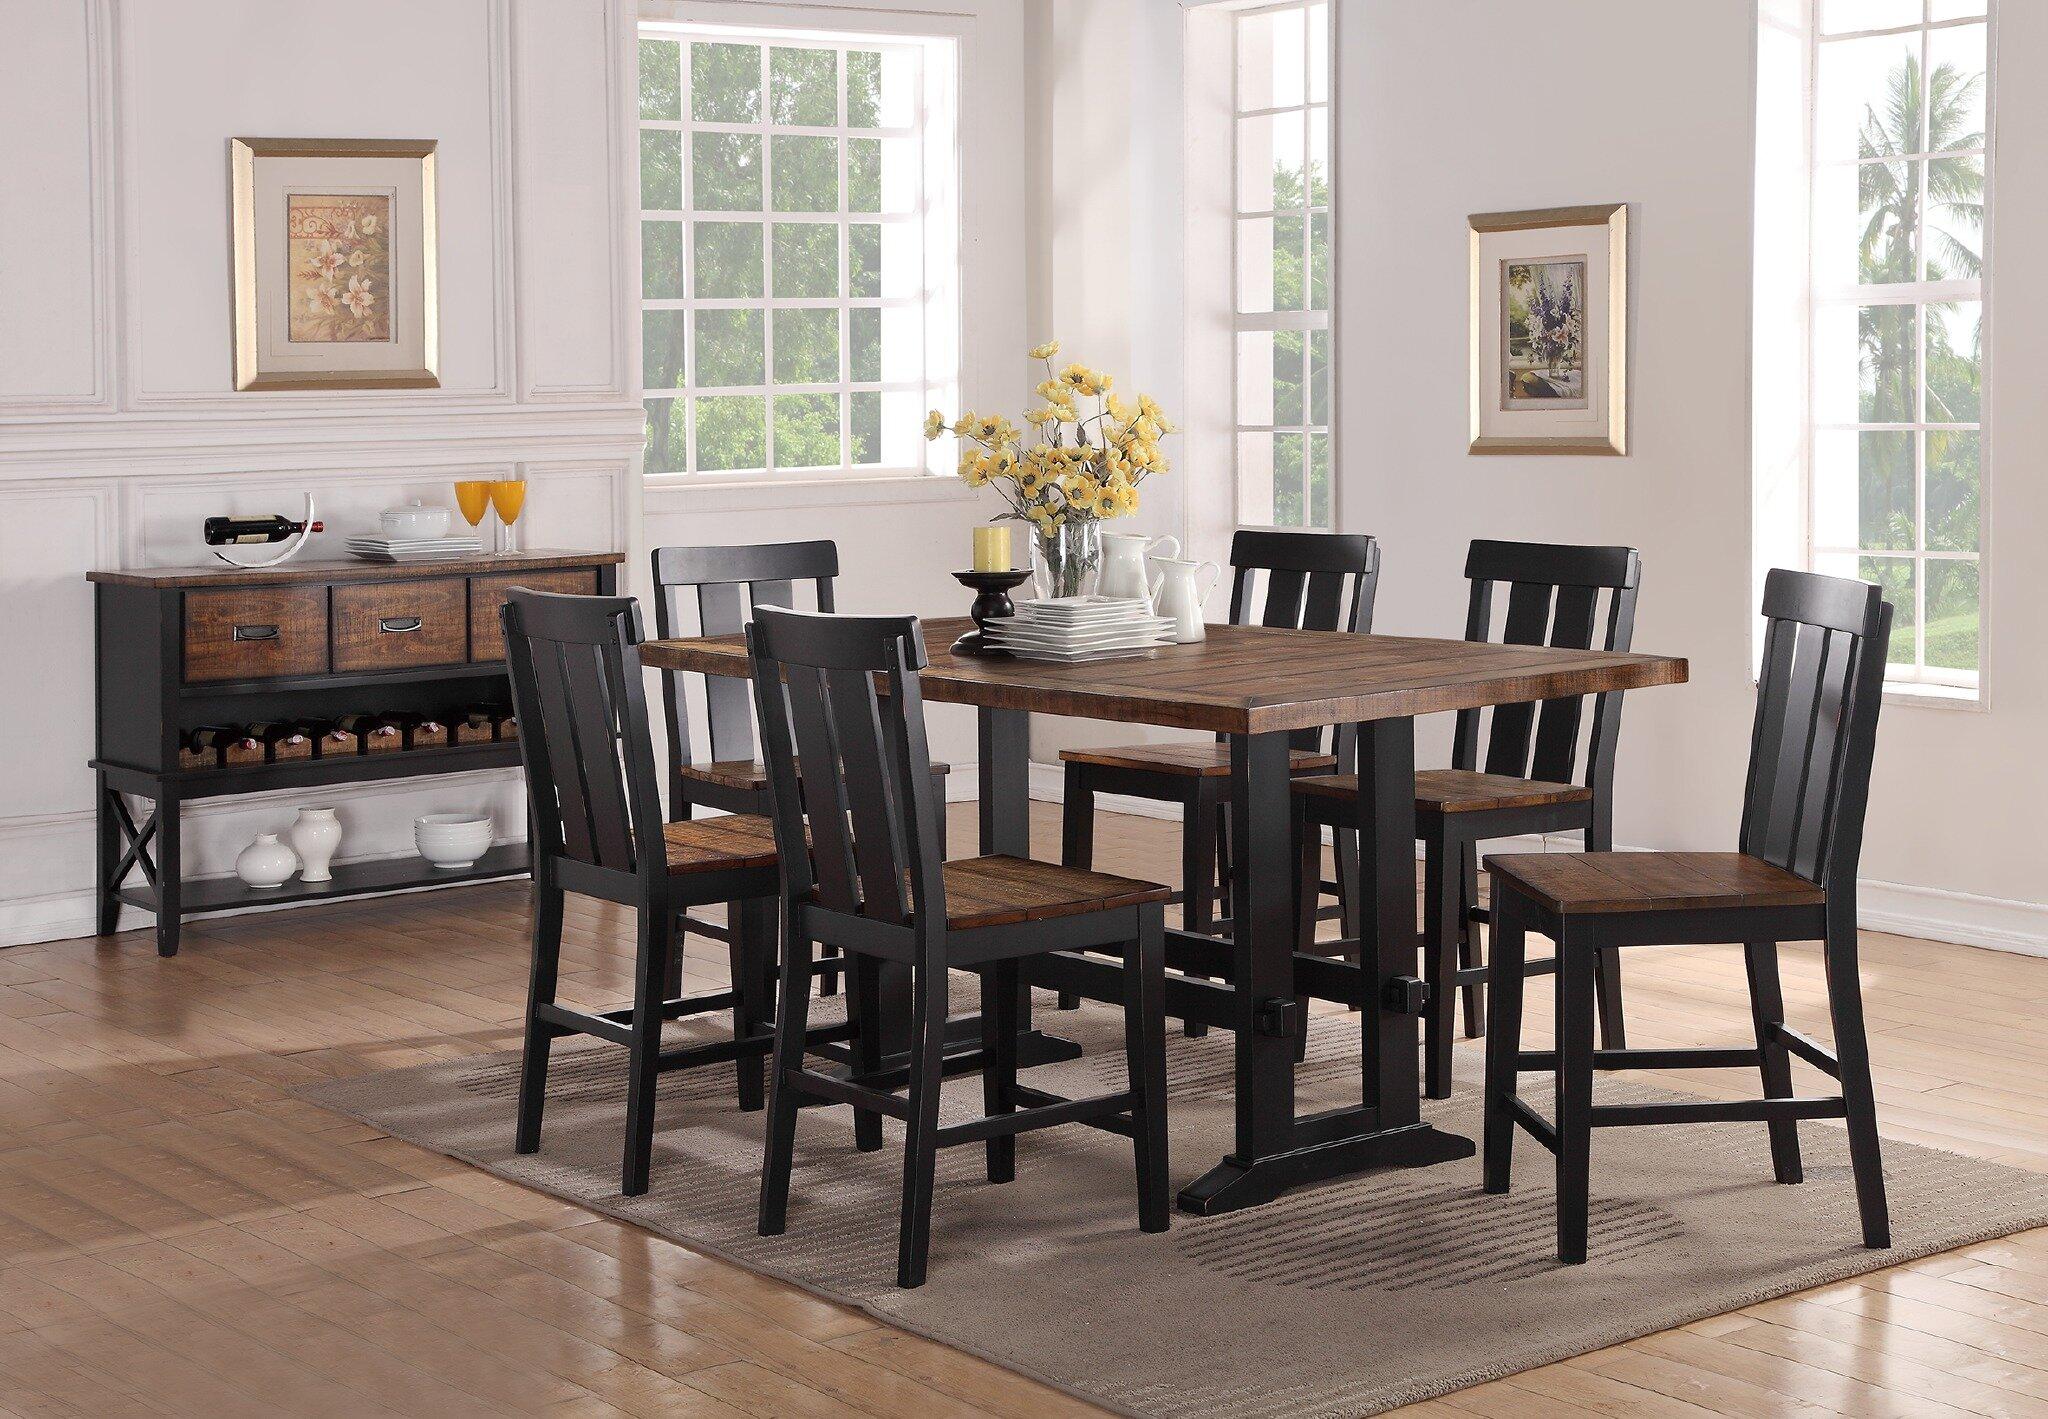 Gracie Oaks Goodman 7 Piece Counter Height Dining Set U0026 Reviews   Wayfair